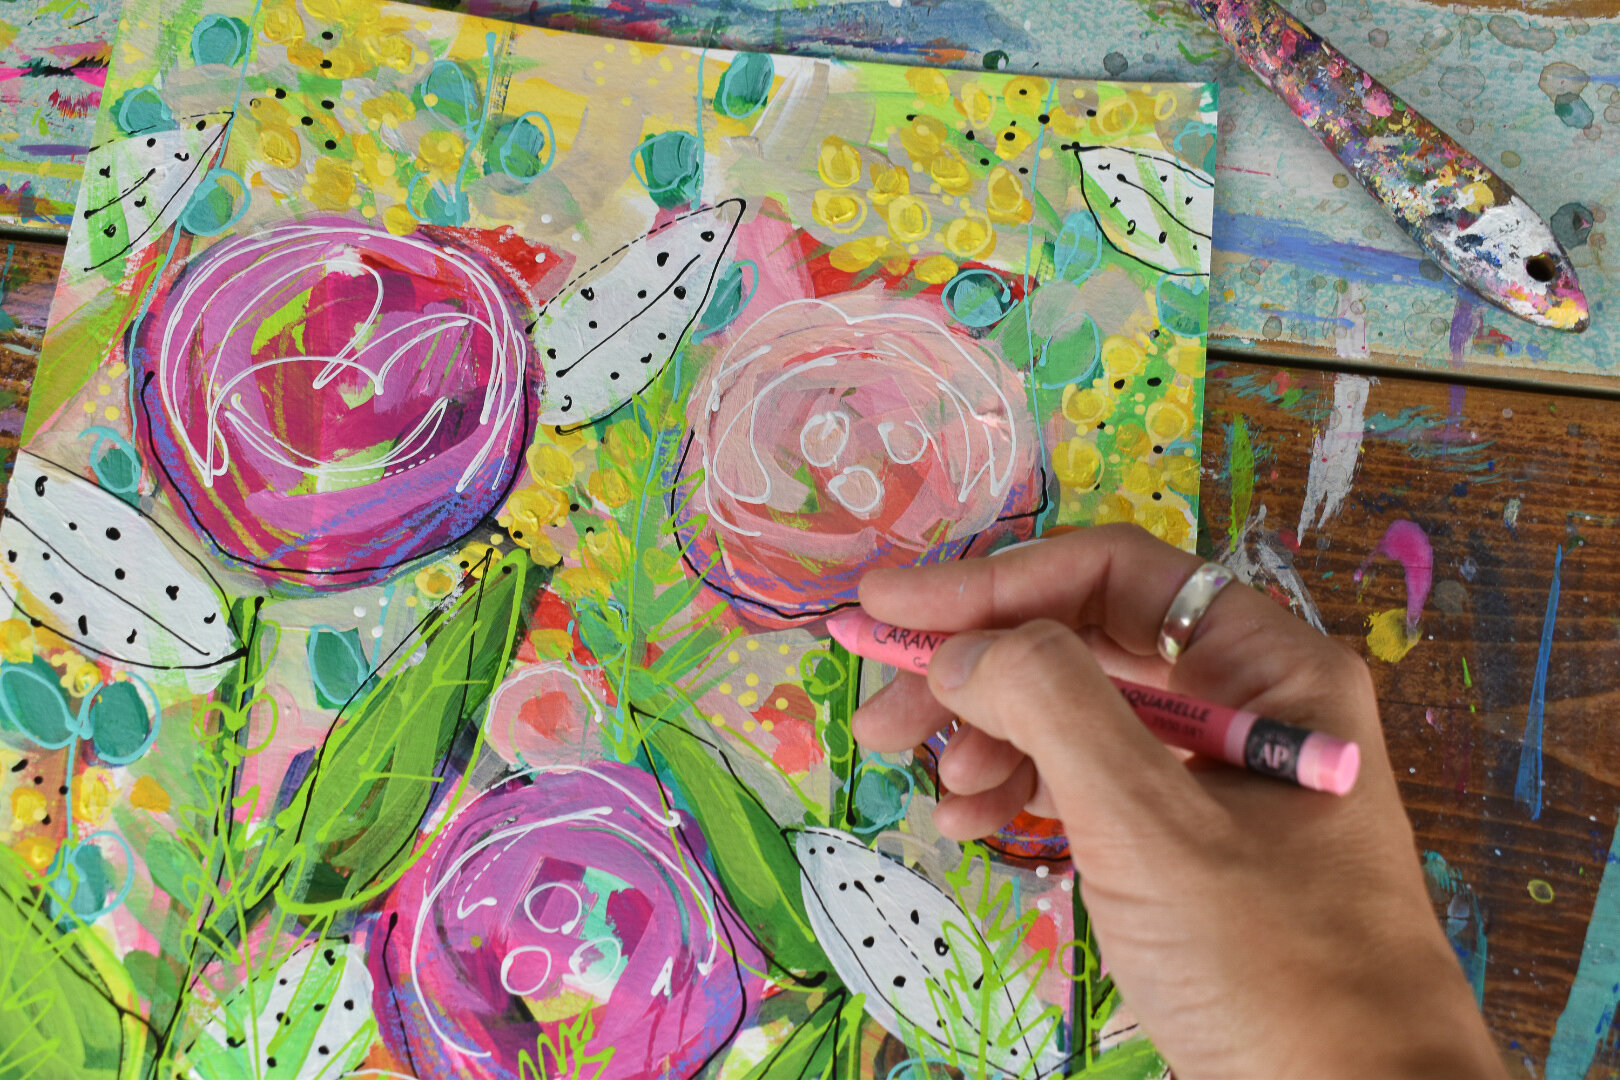 abstract_boho_flowers_painting_daisyfaithart_5.jpg